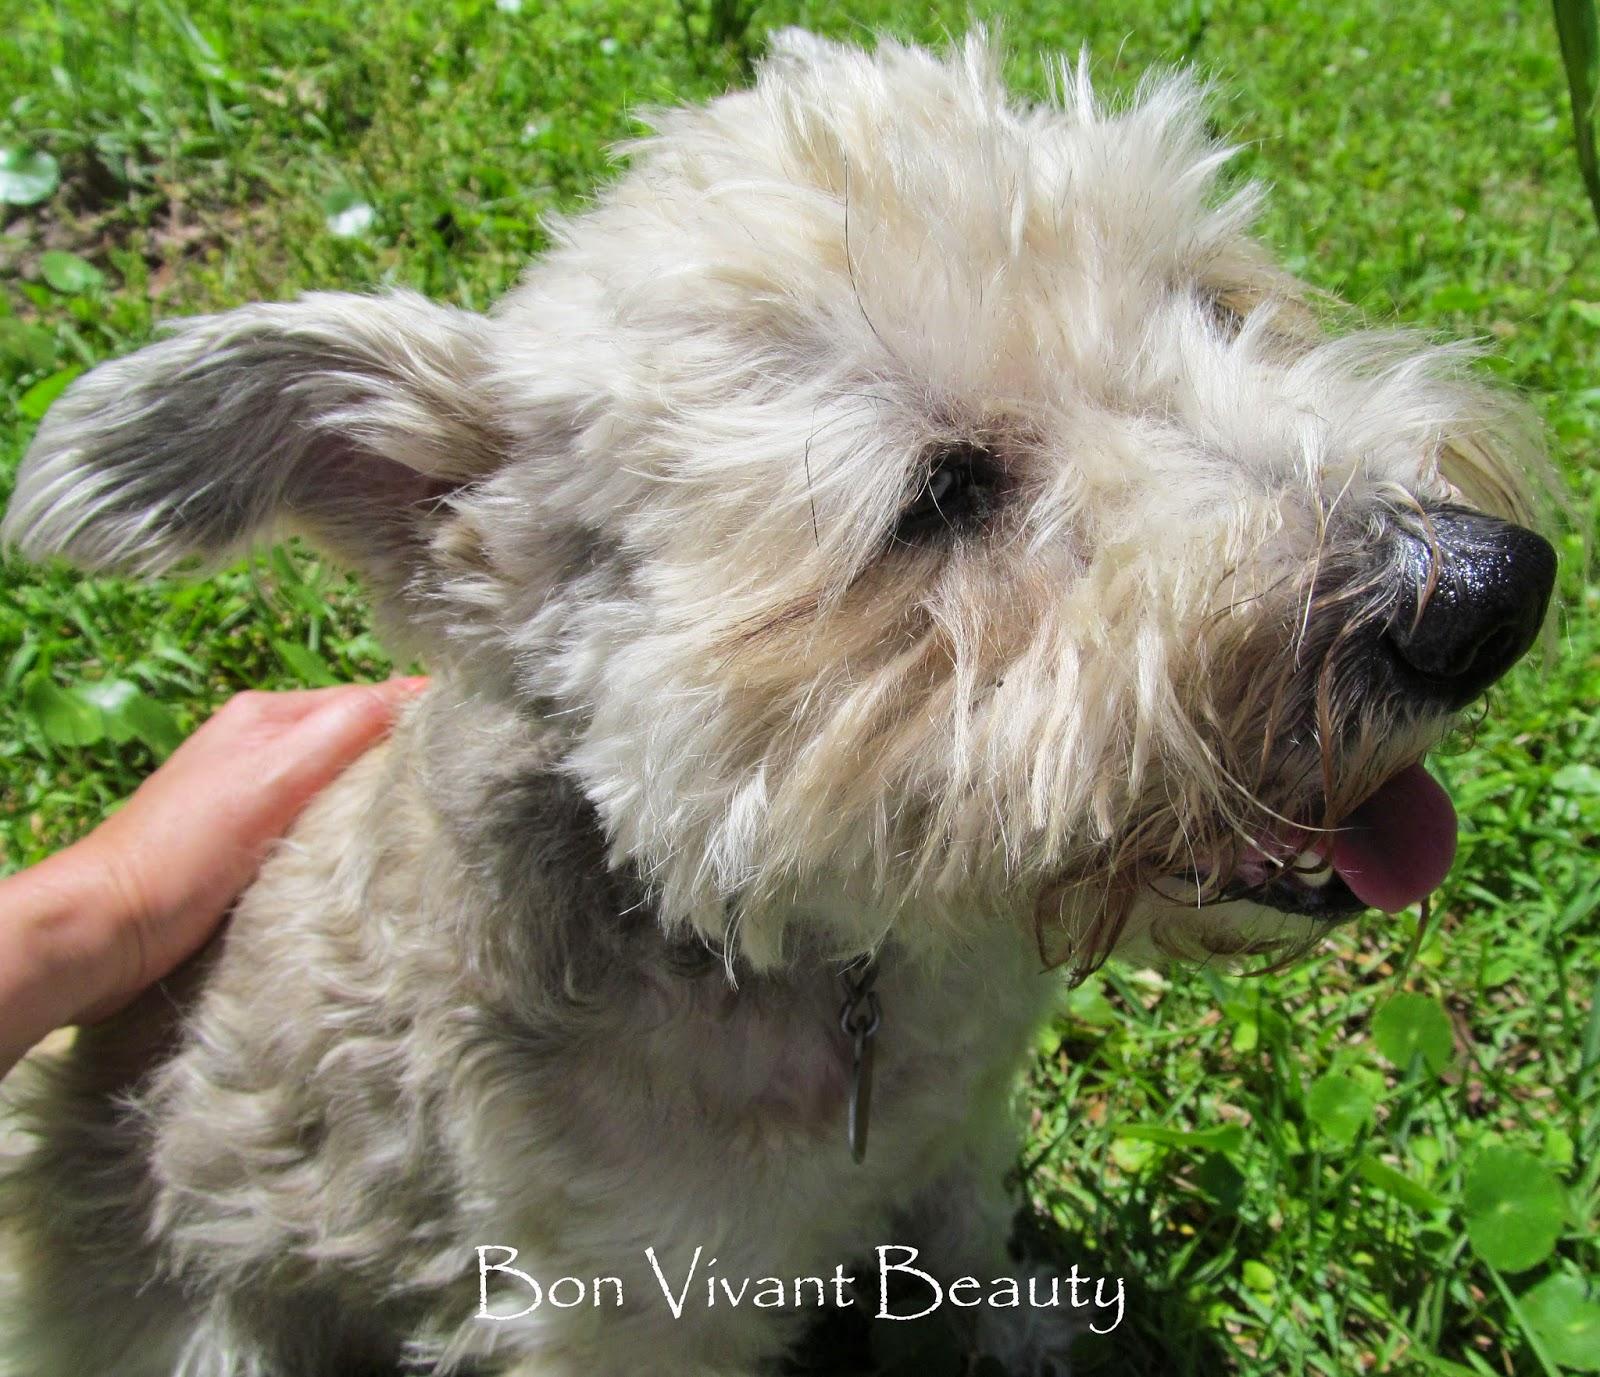 Bon Vivant Beauty: NOTD: Julep's Hartleigh #477119